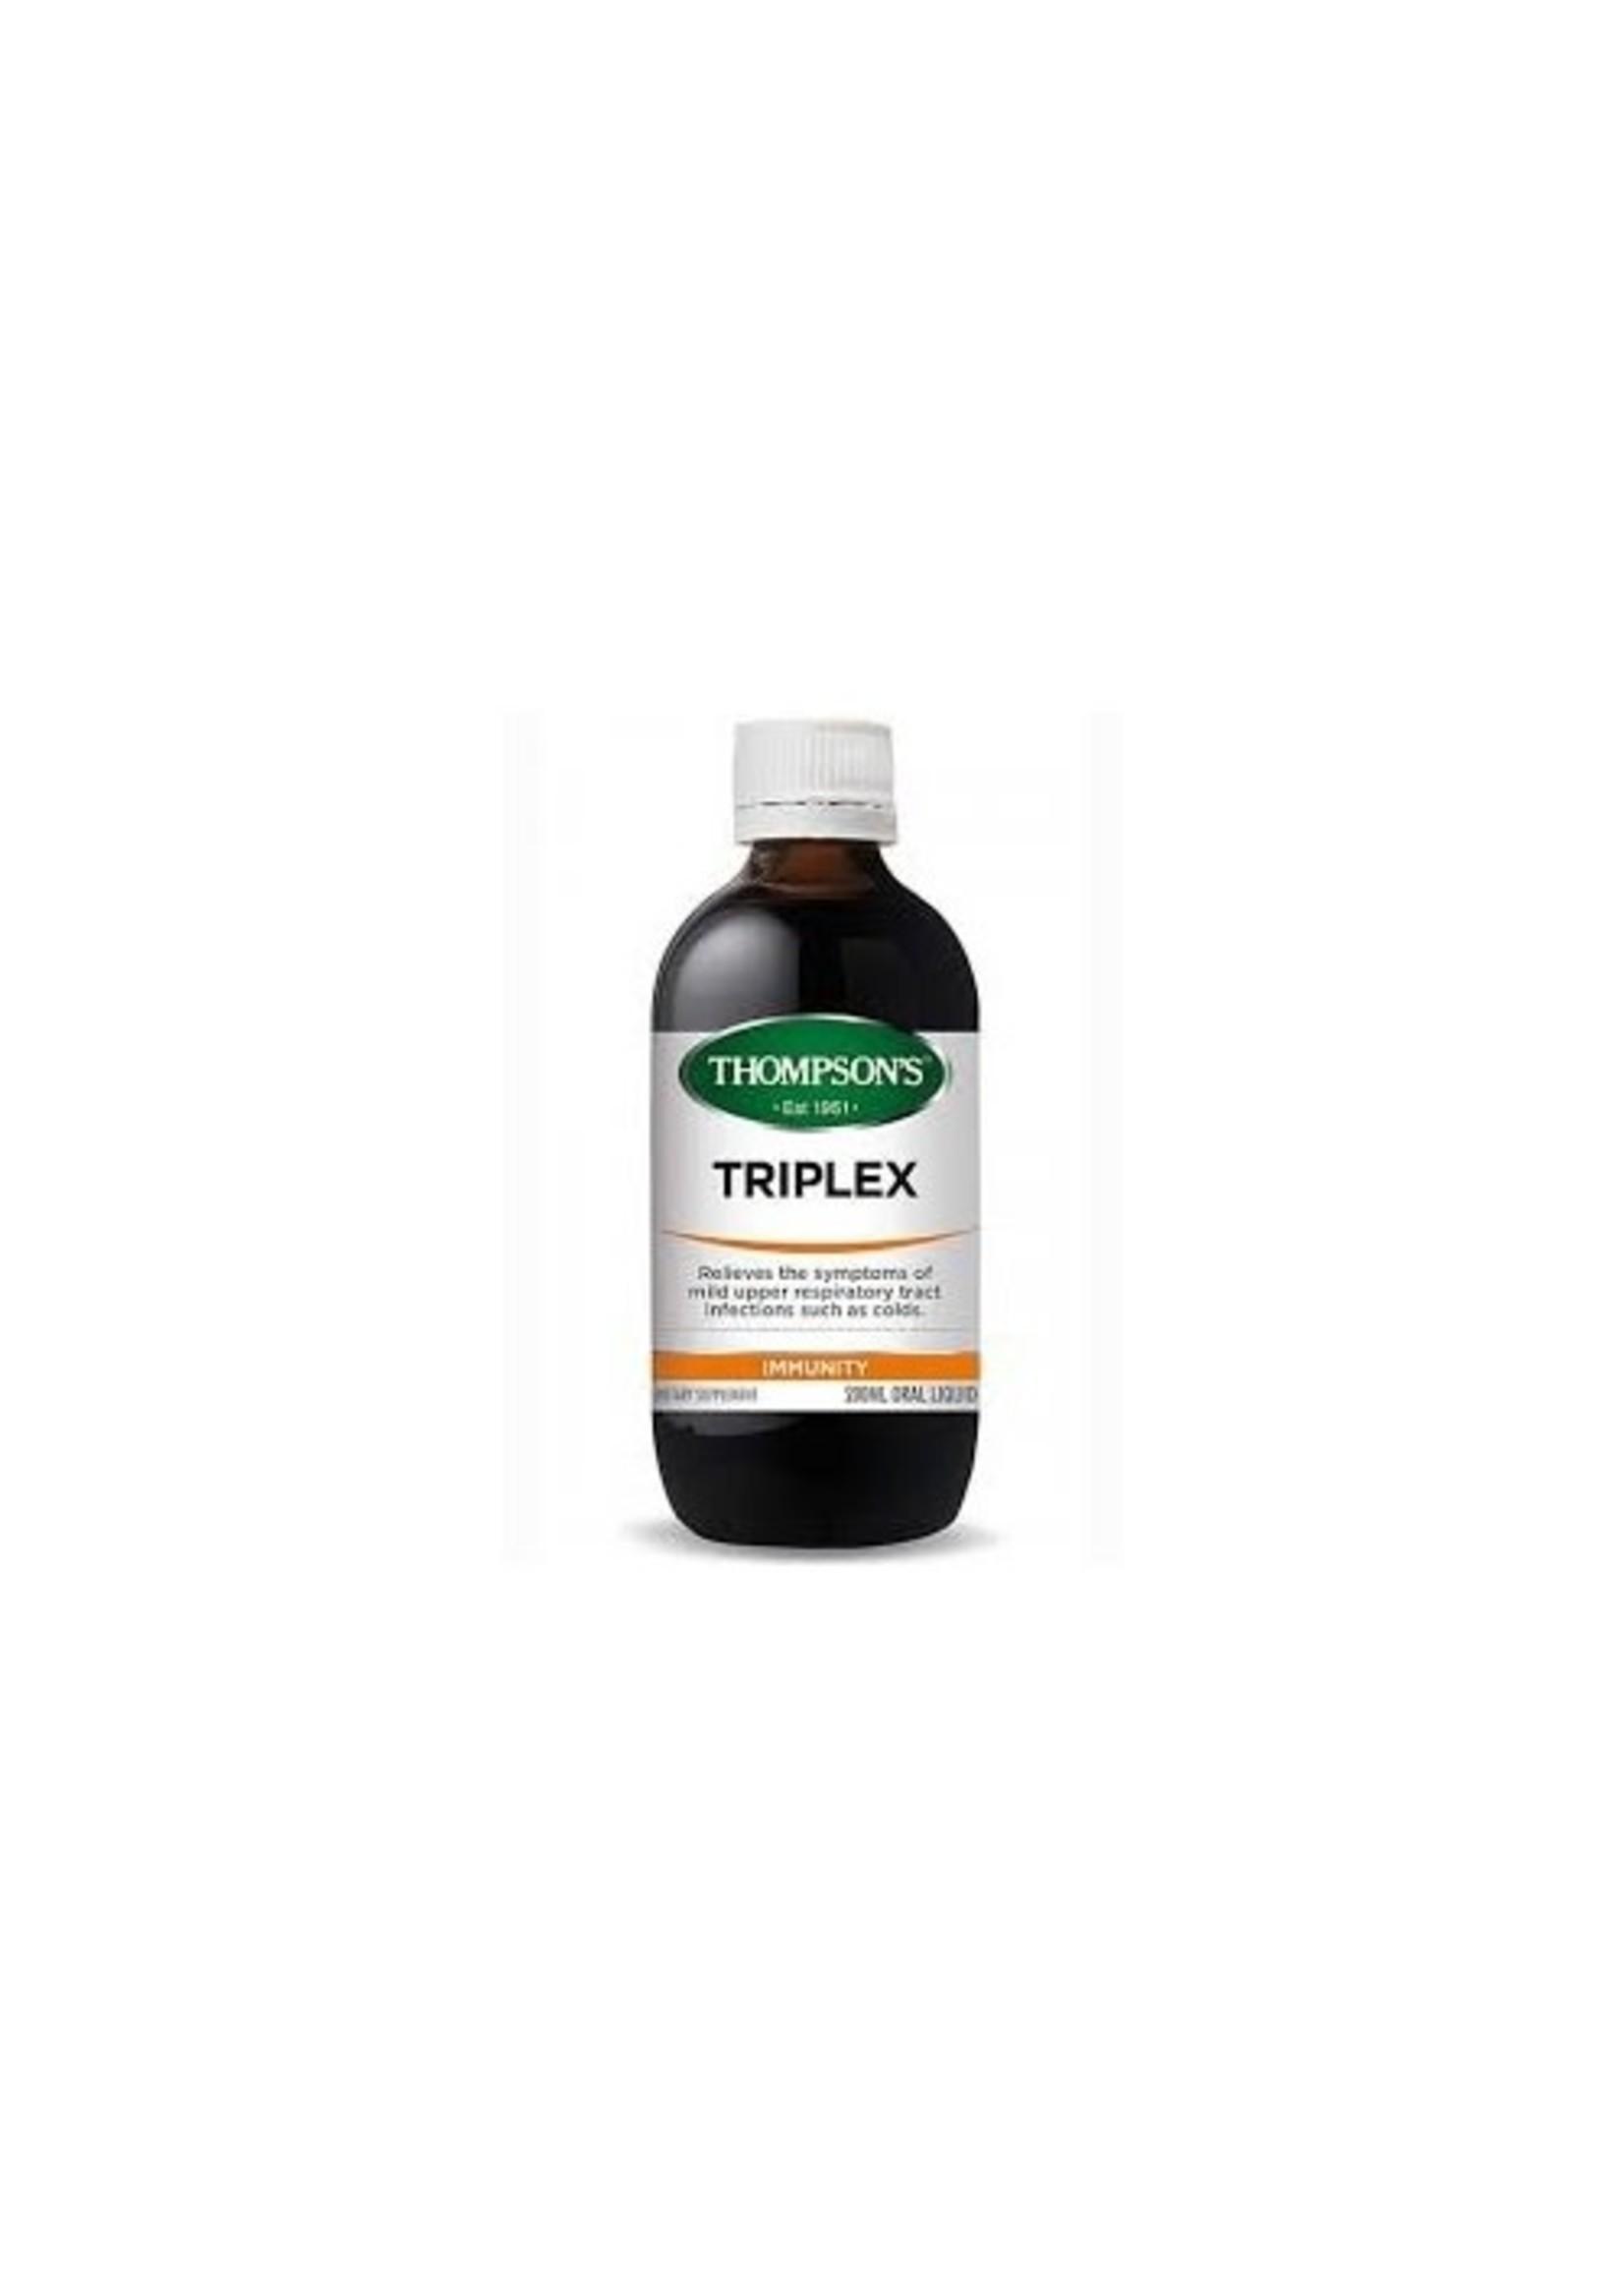 Thompson's Thompsons Triplex 200 ml